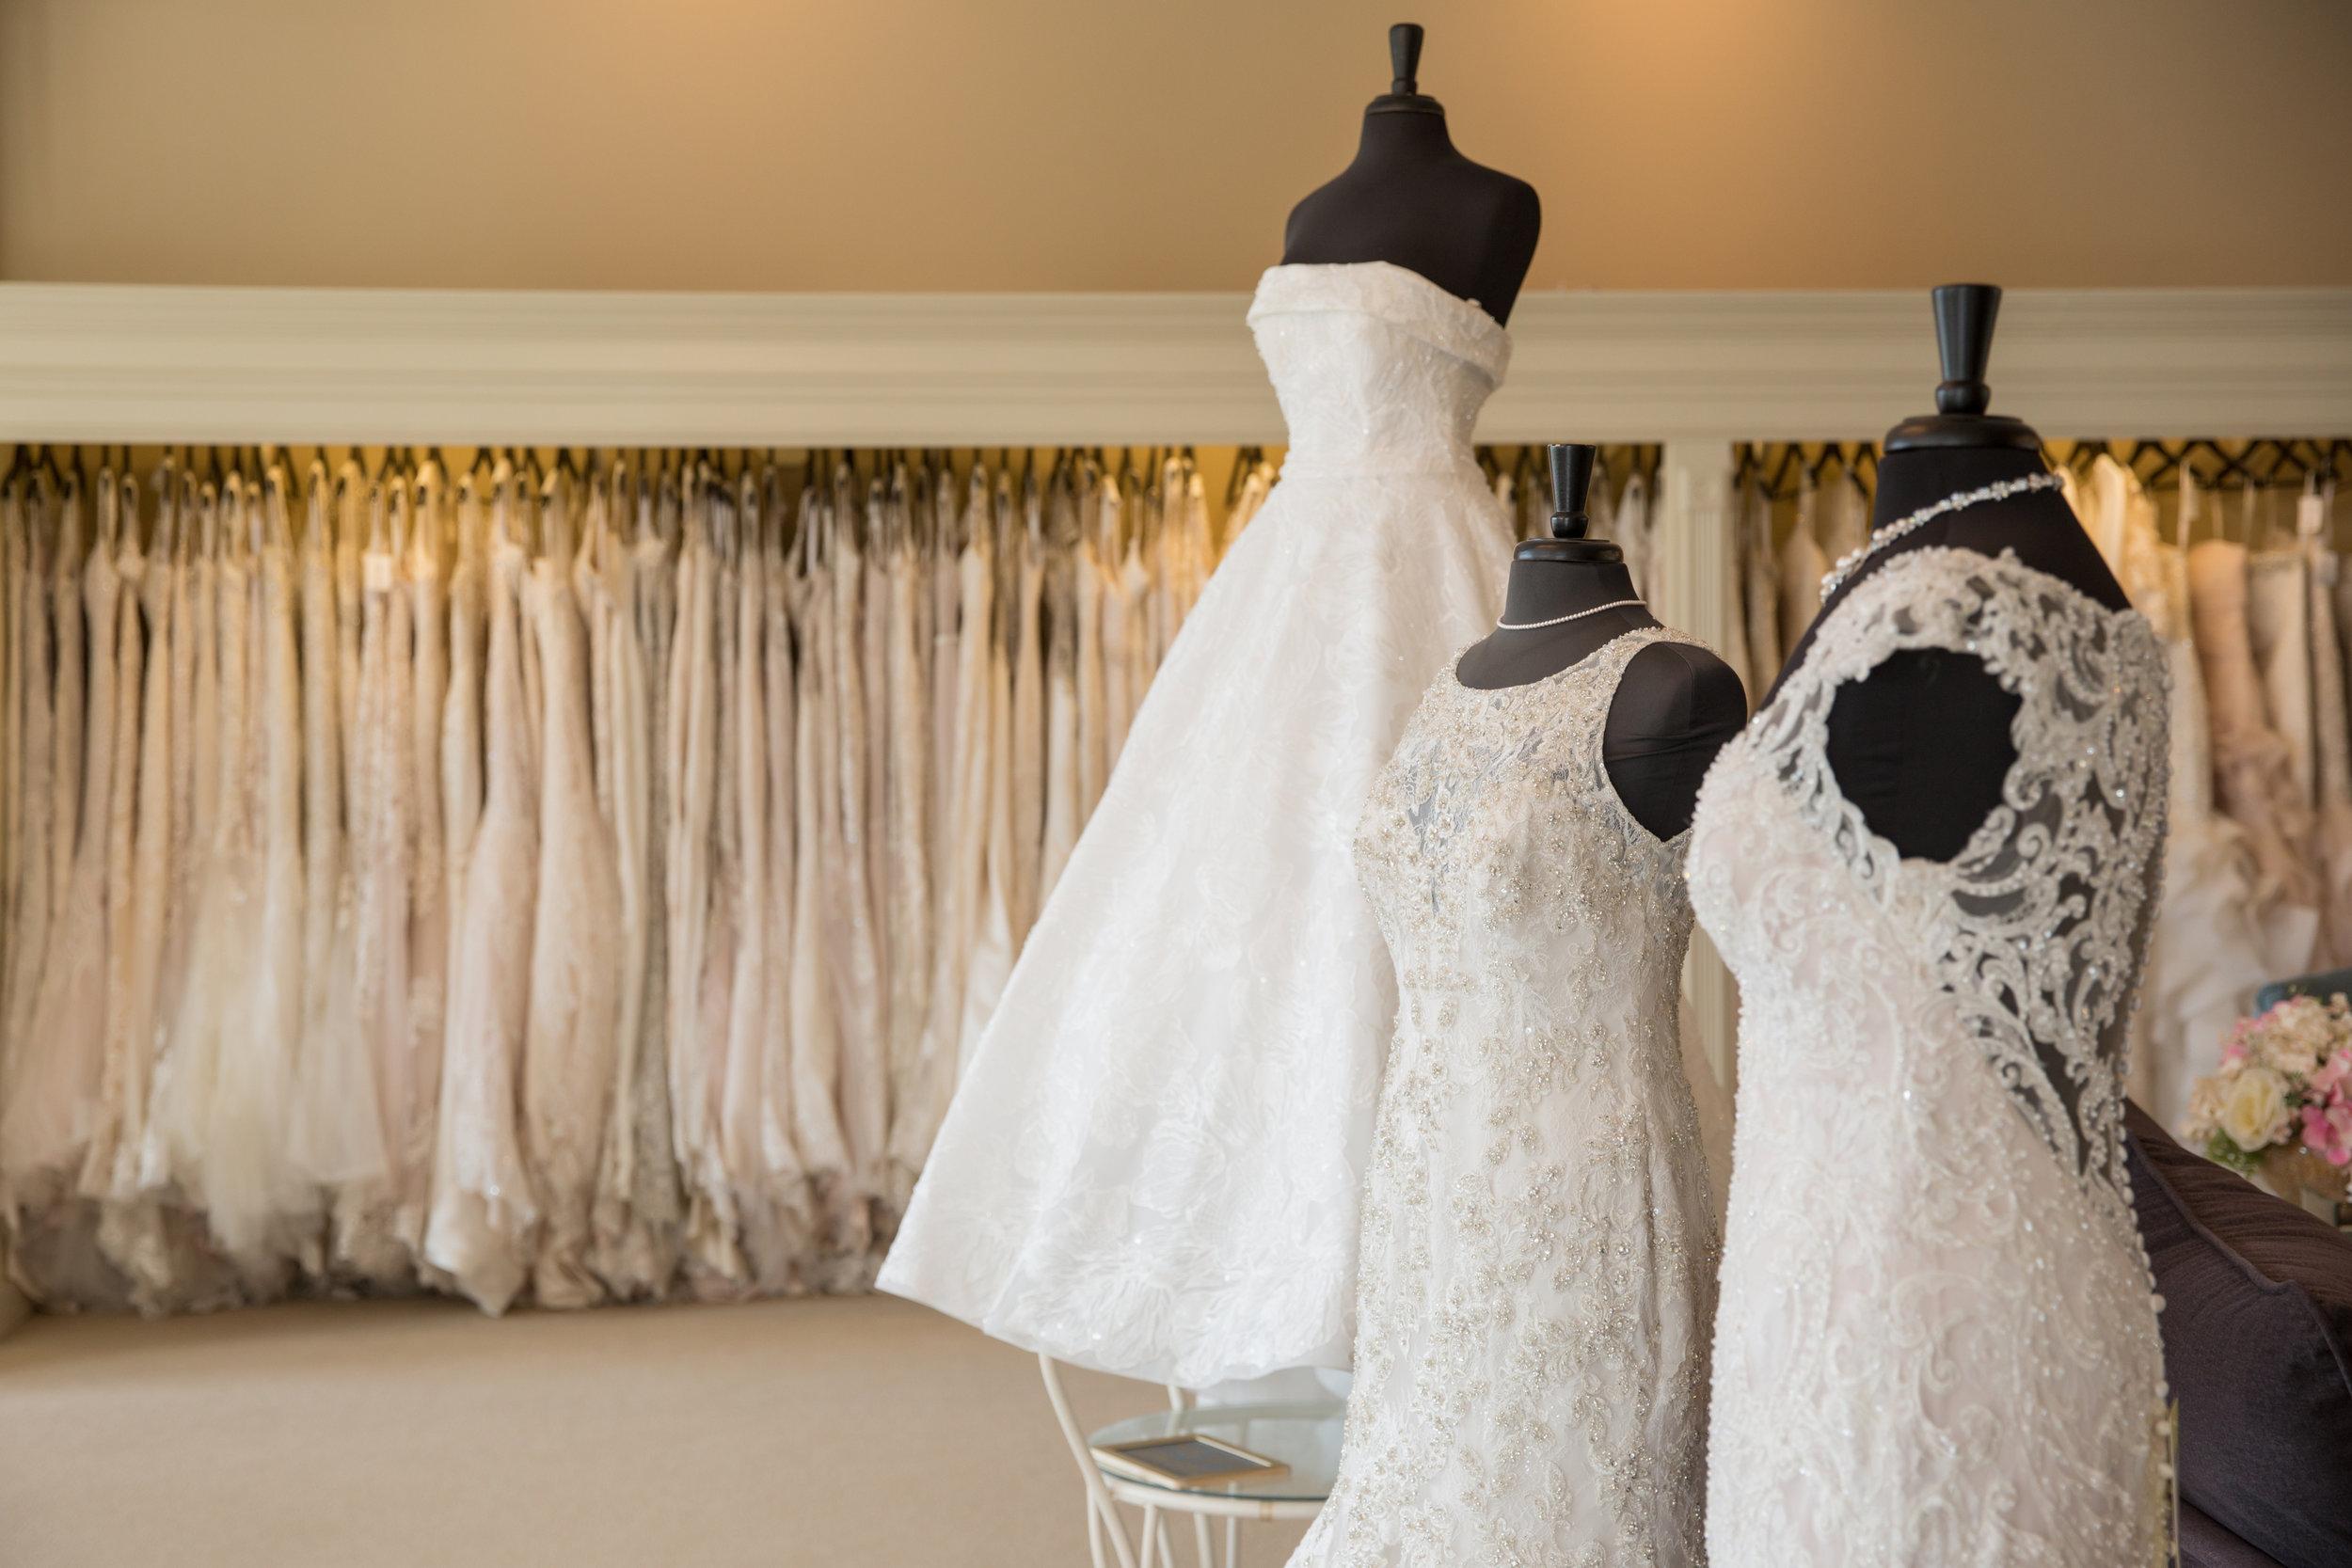 Baton Rouge Wedding Dress - 6